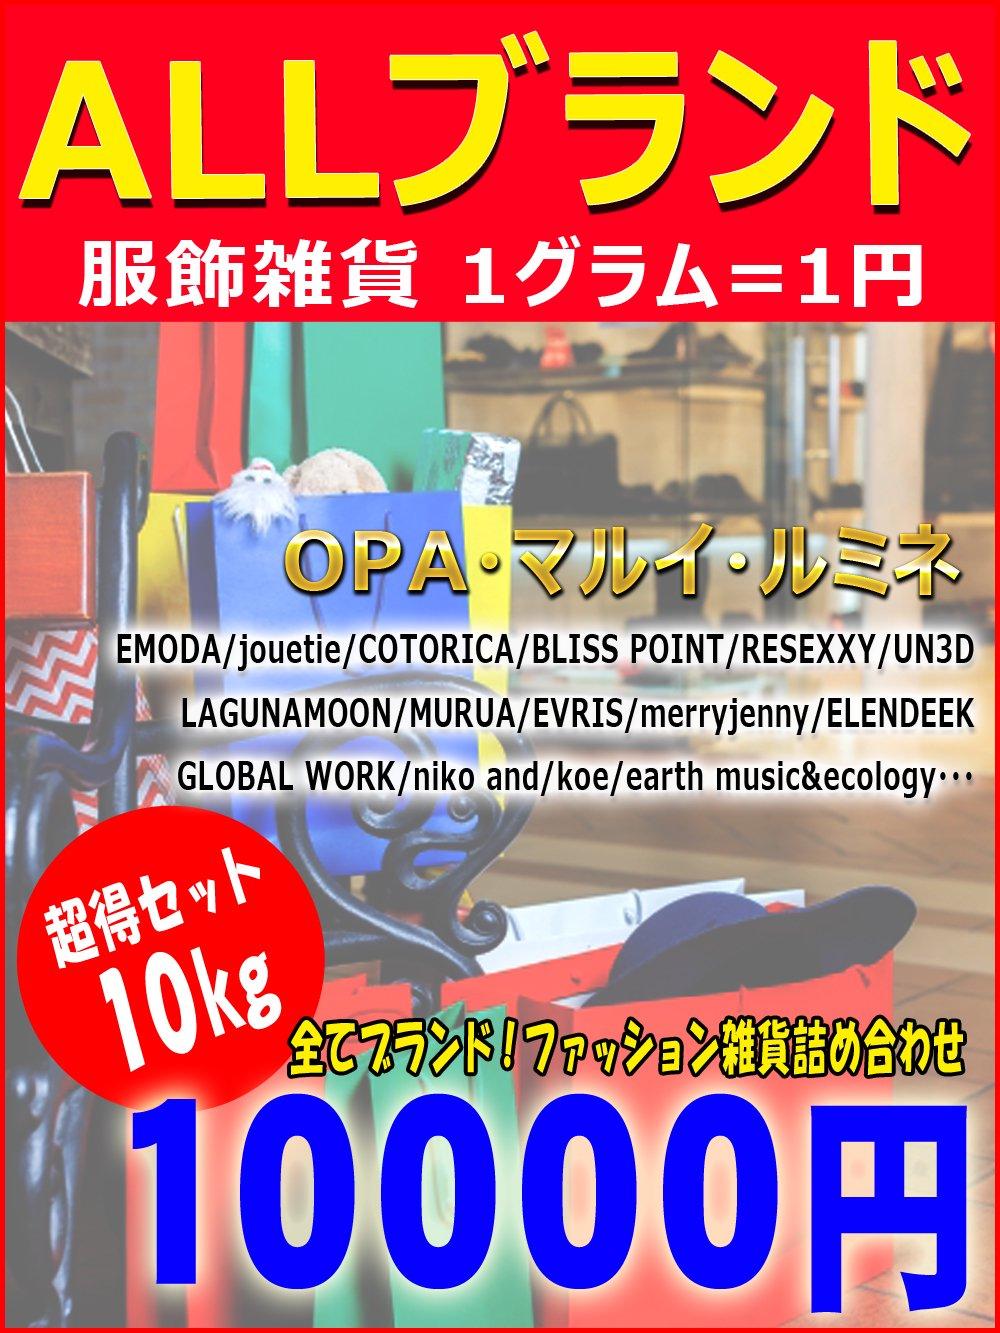 OPA・マルイ・ルミネ系ブランドのみ!服飾雑貨詰め合わせ【 10kg 】1g=1円